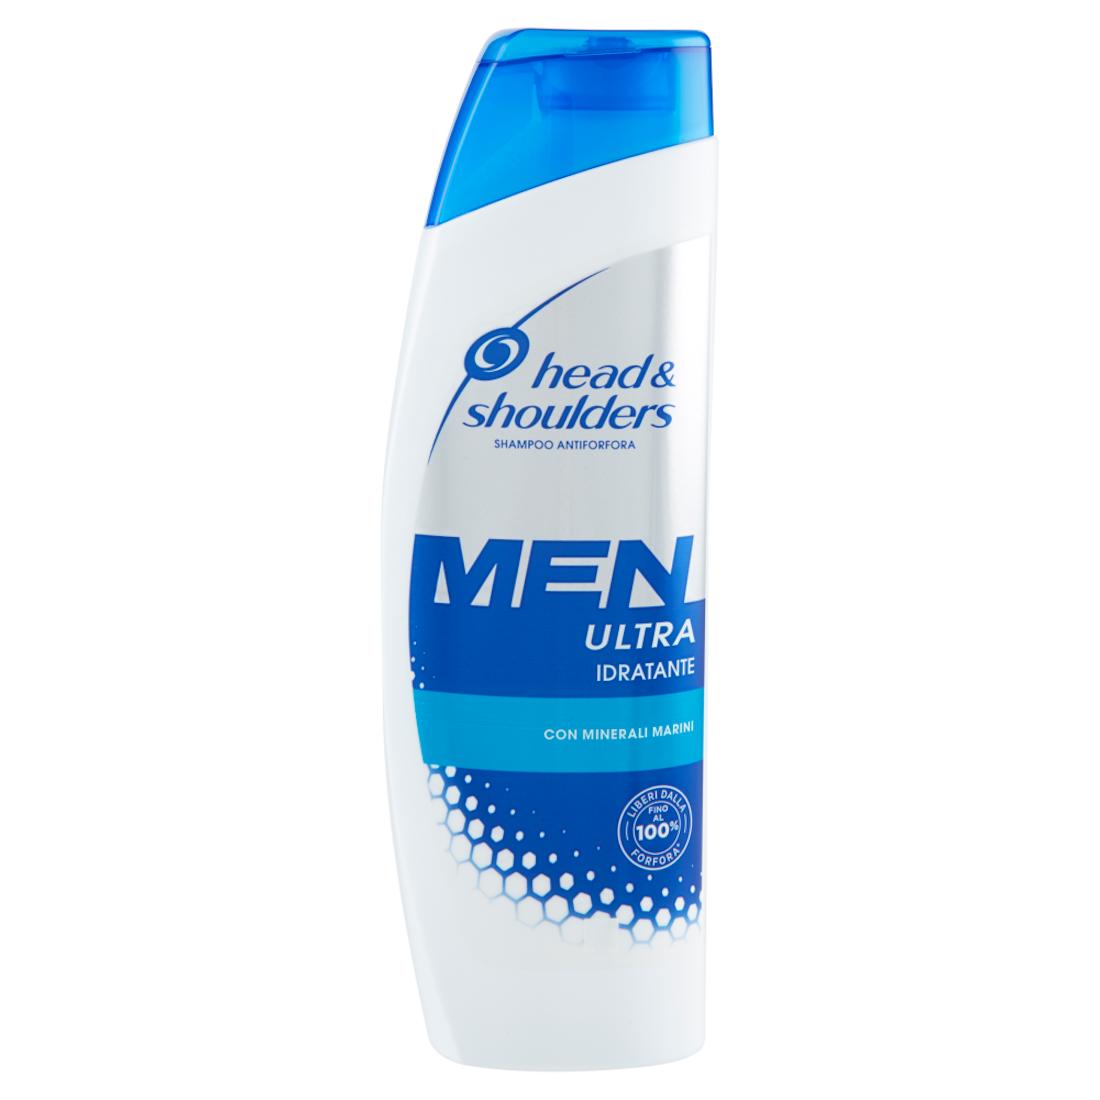 HEAD&SHOULDERS Men Ultra Idratante Shampoo Antiforfora 225ml